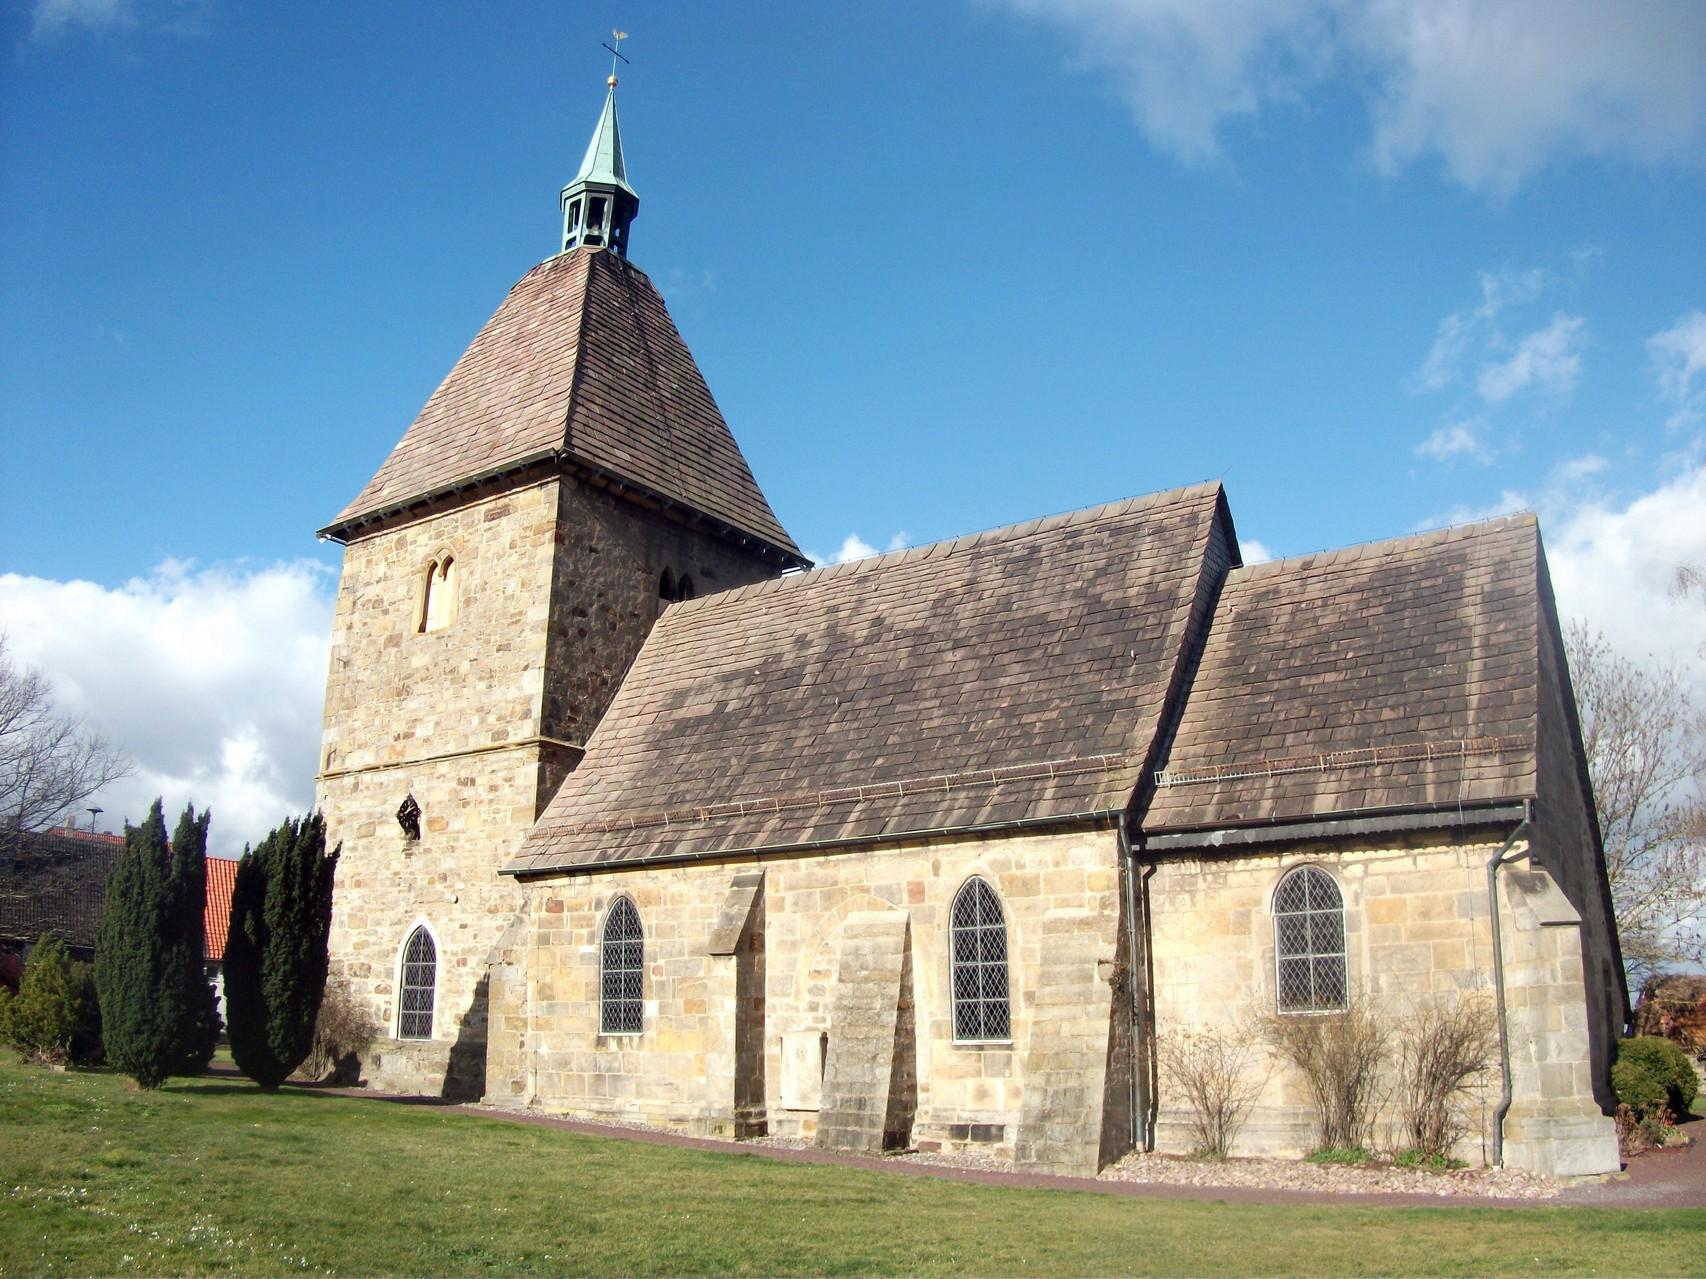 St.-Ägidien-Kirche in Hülsede